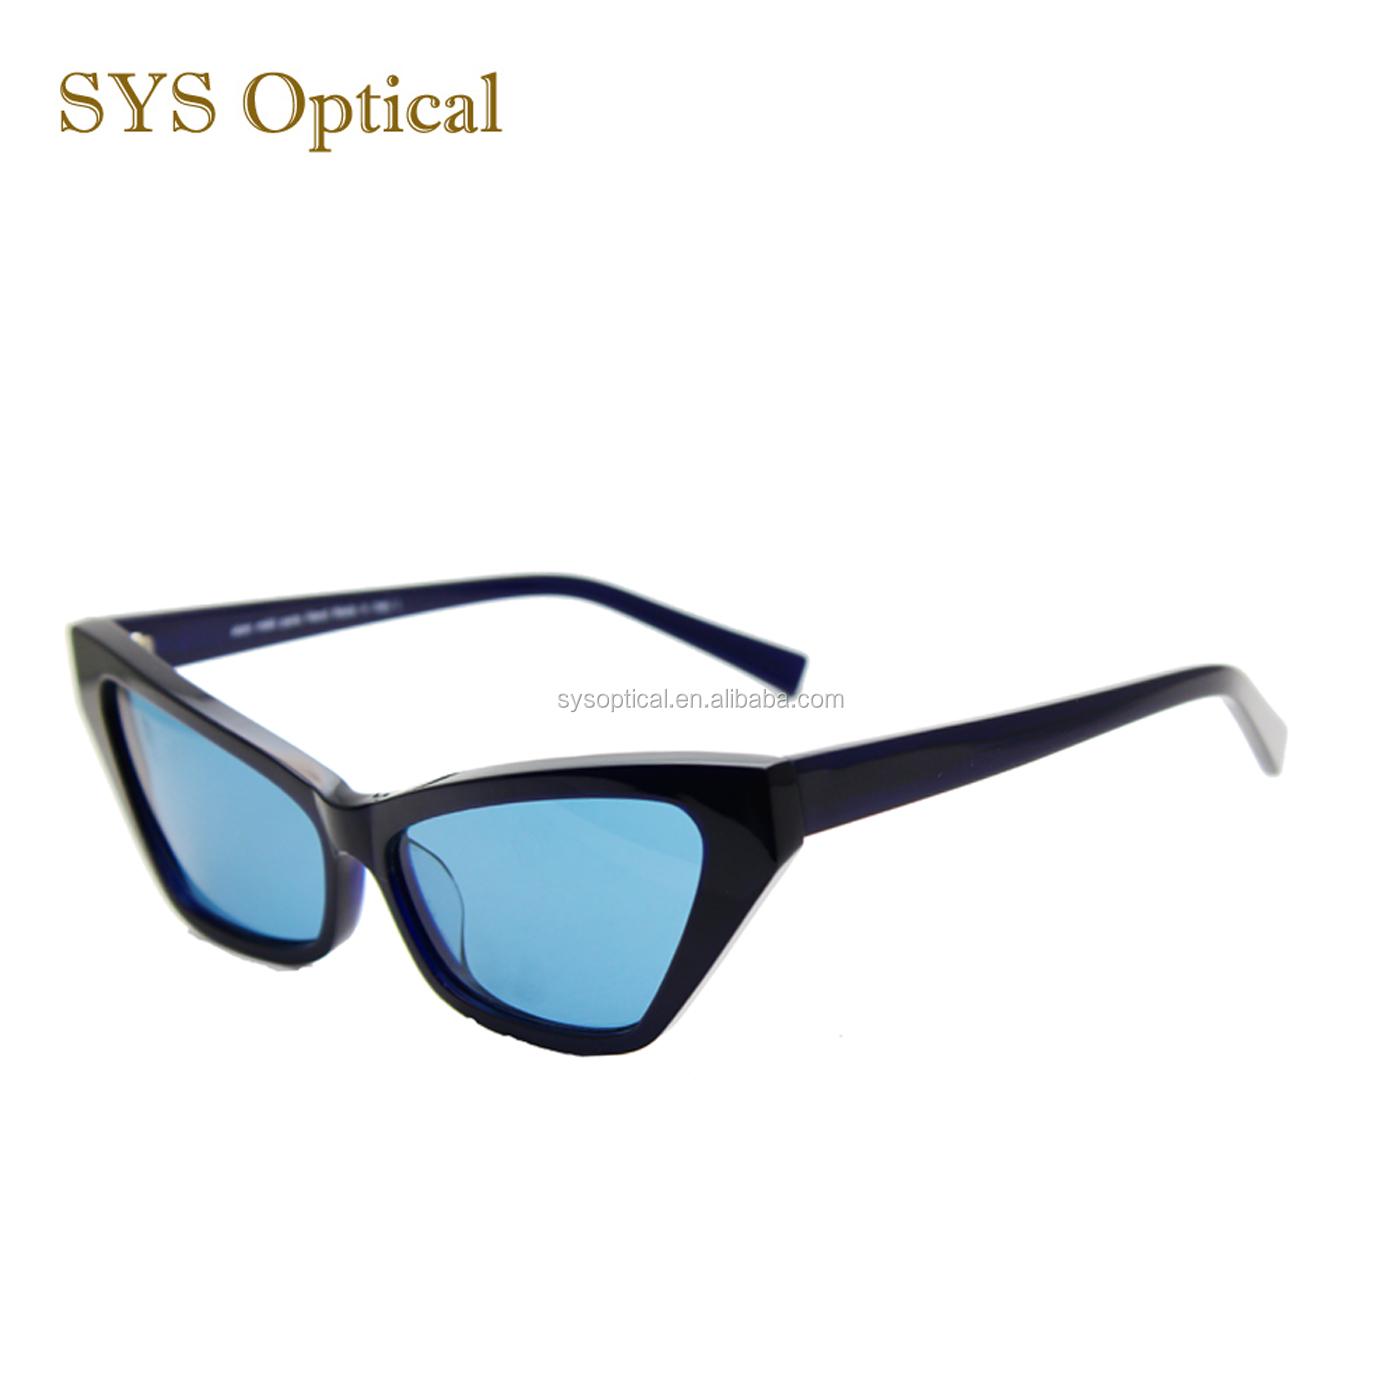 9f58fdbdfe1 China Uv400 Brand Sunglasses